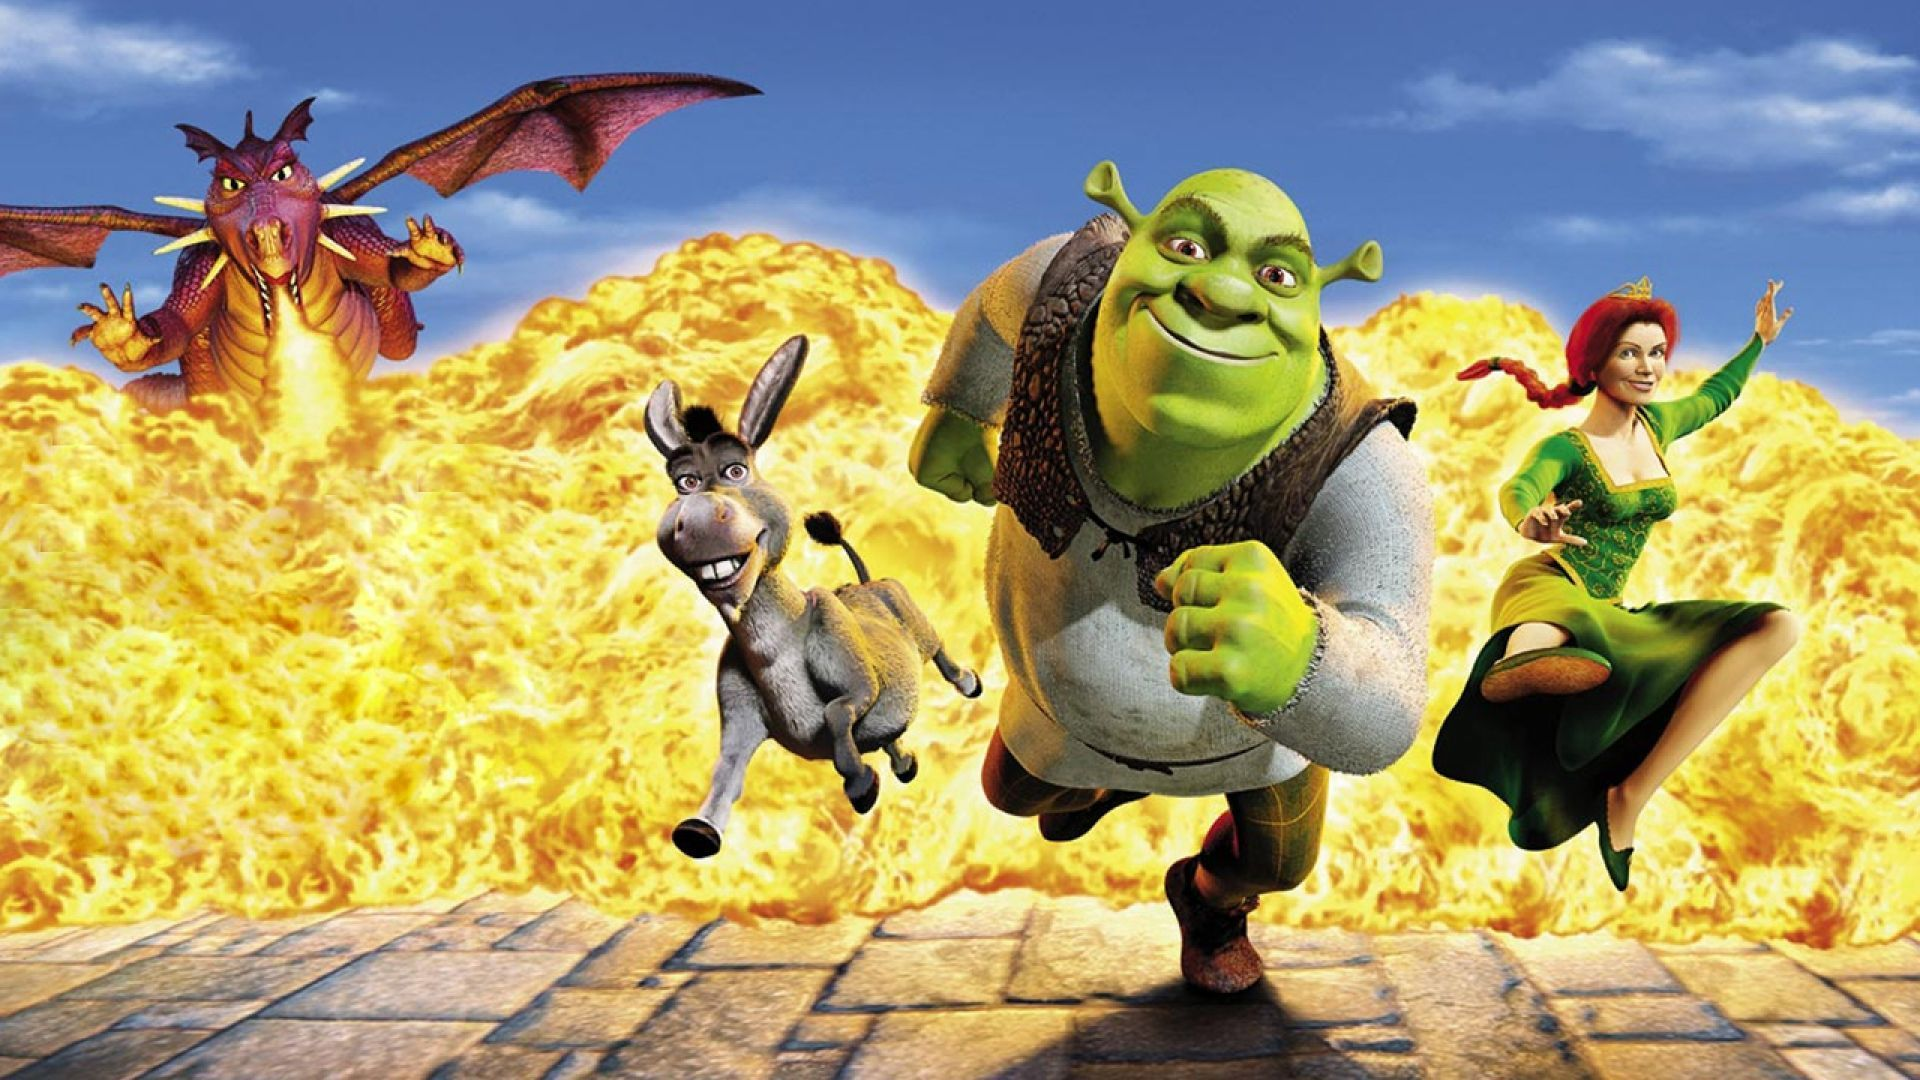 Shrek 2 Wallpaper Posted By John Anderson